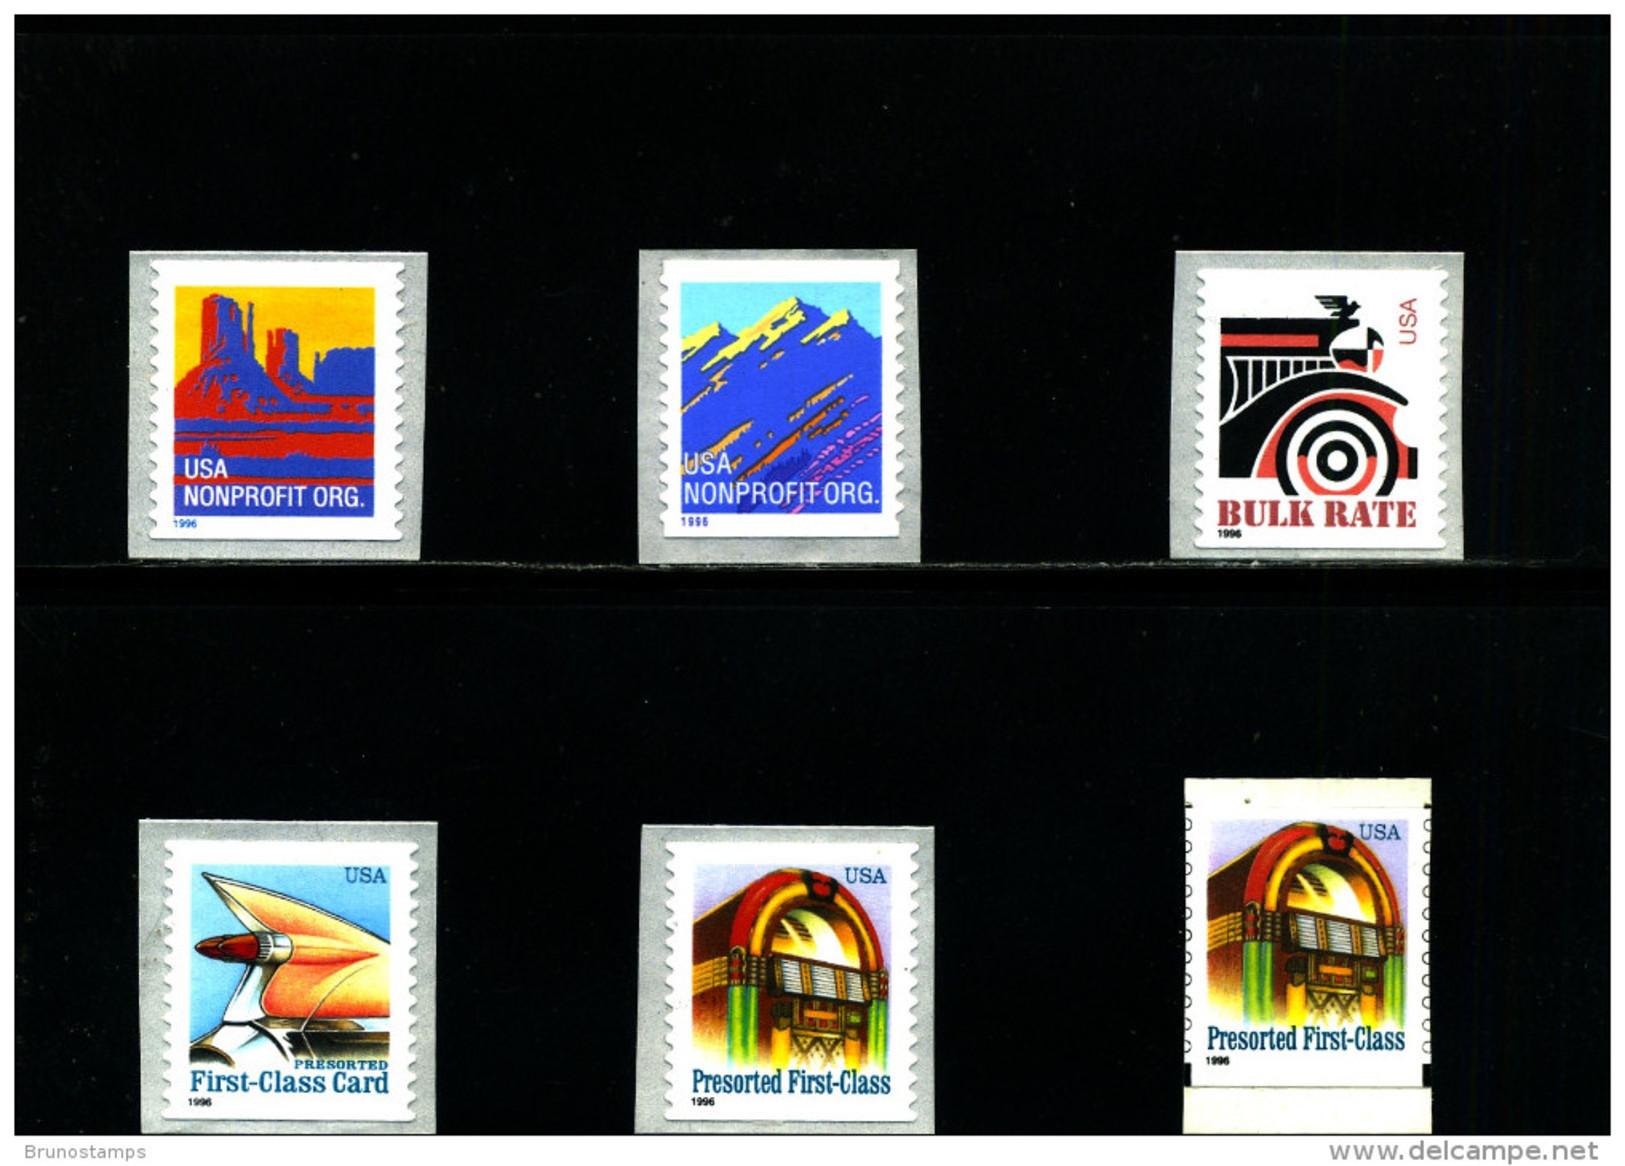 UNITED STATES/USA - 1996  DEFINITIVES  SELF ADHESIVE  SET  MINT NH - Neufs